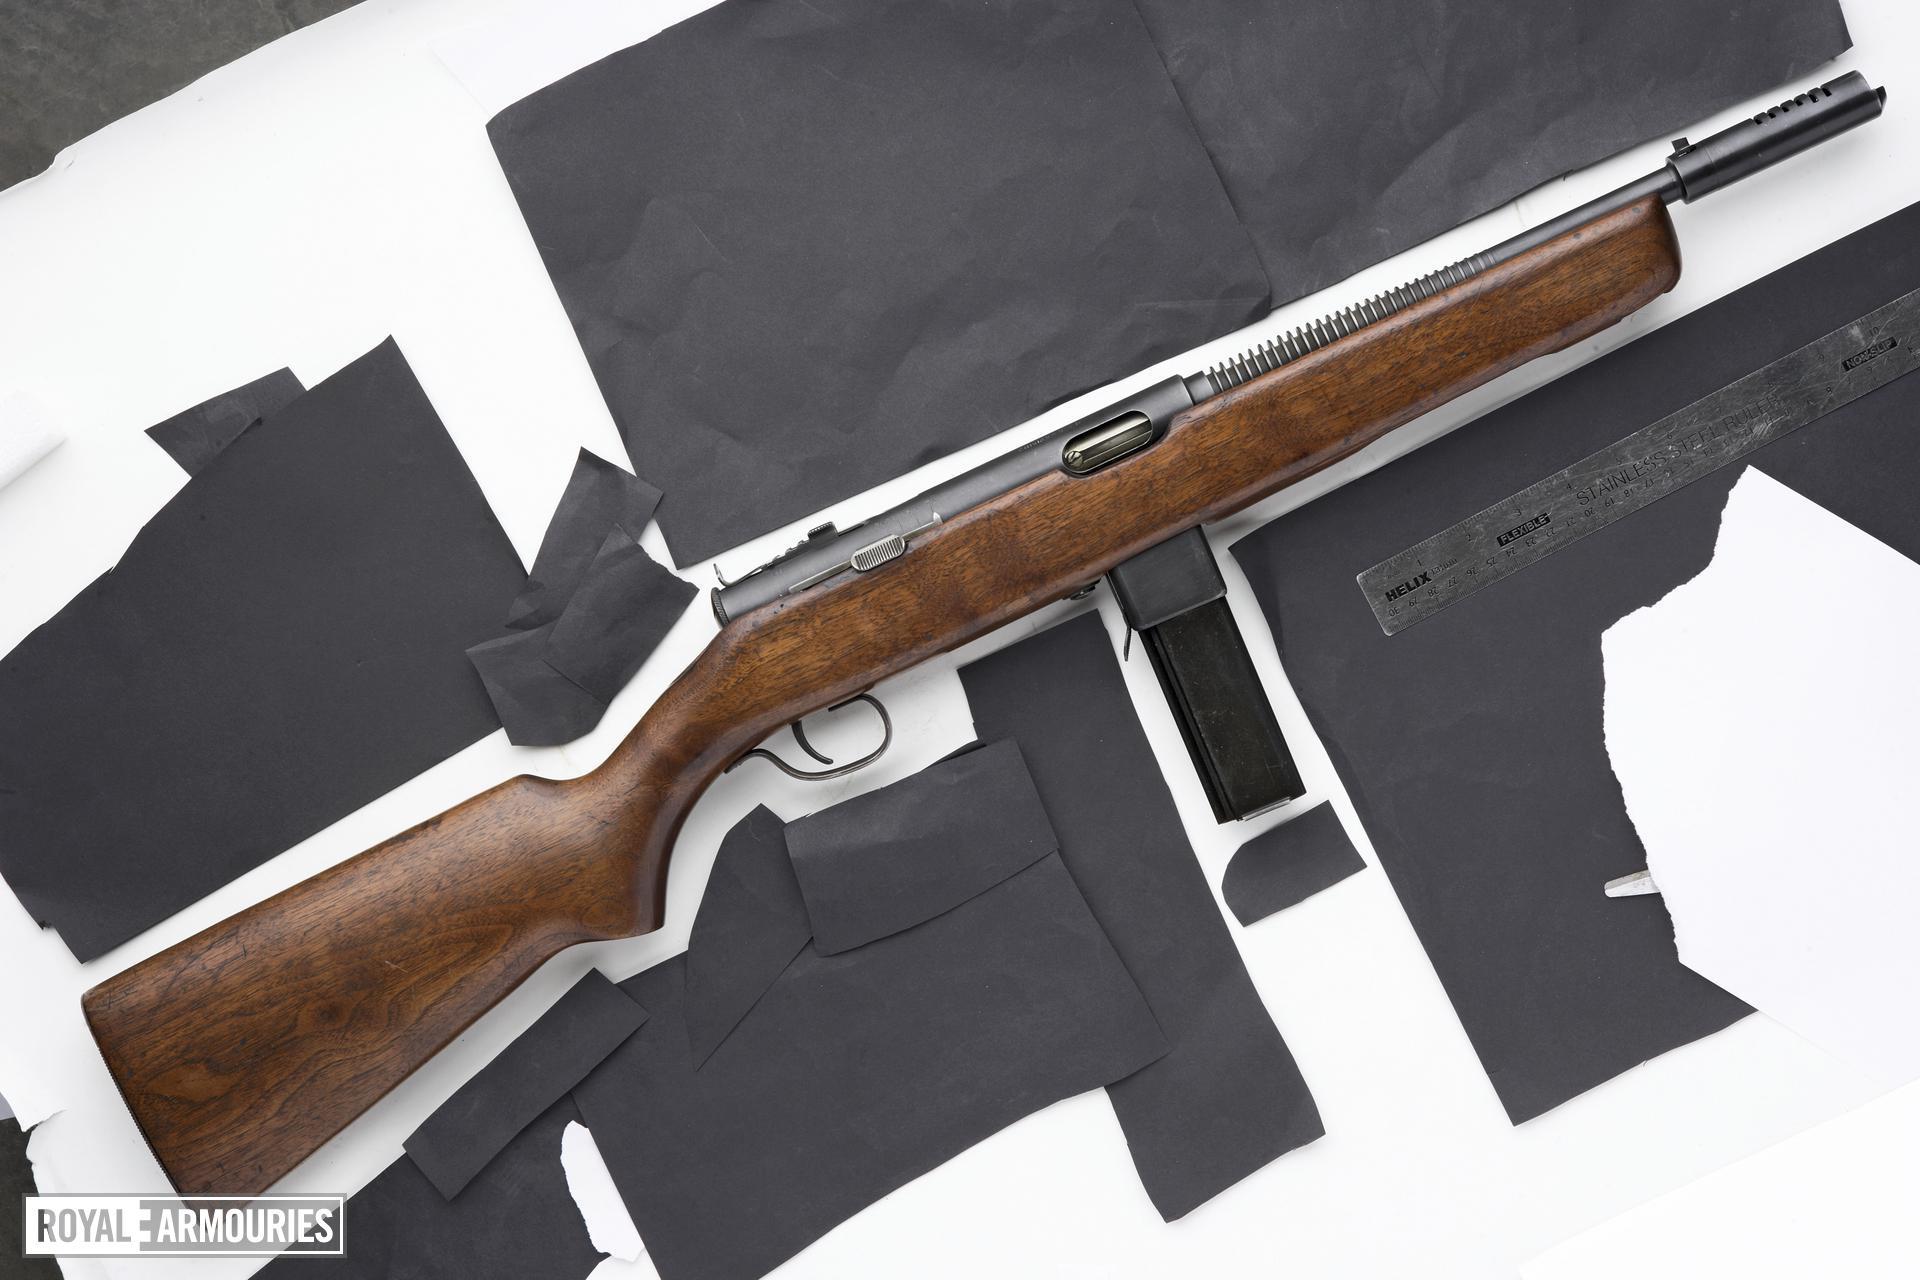 Centrefire automatic submachine gun - Reising Model 50